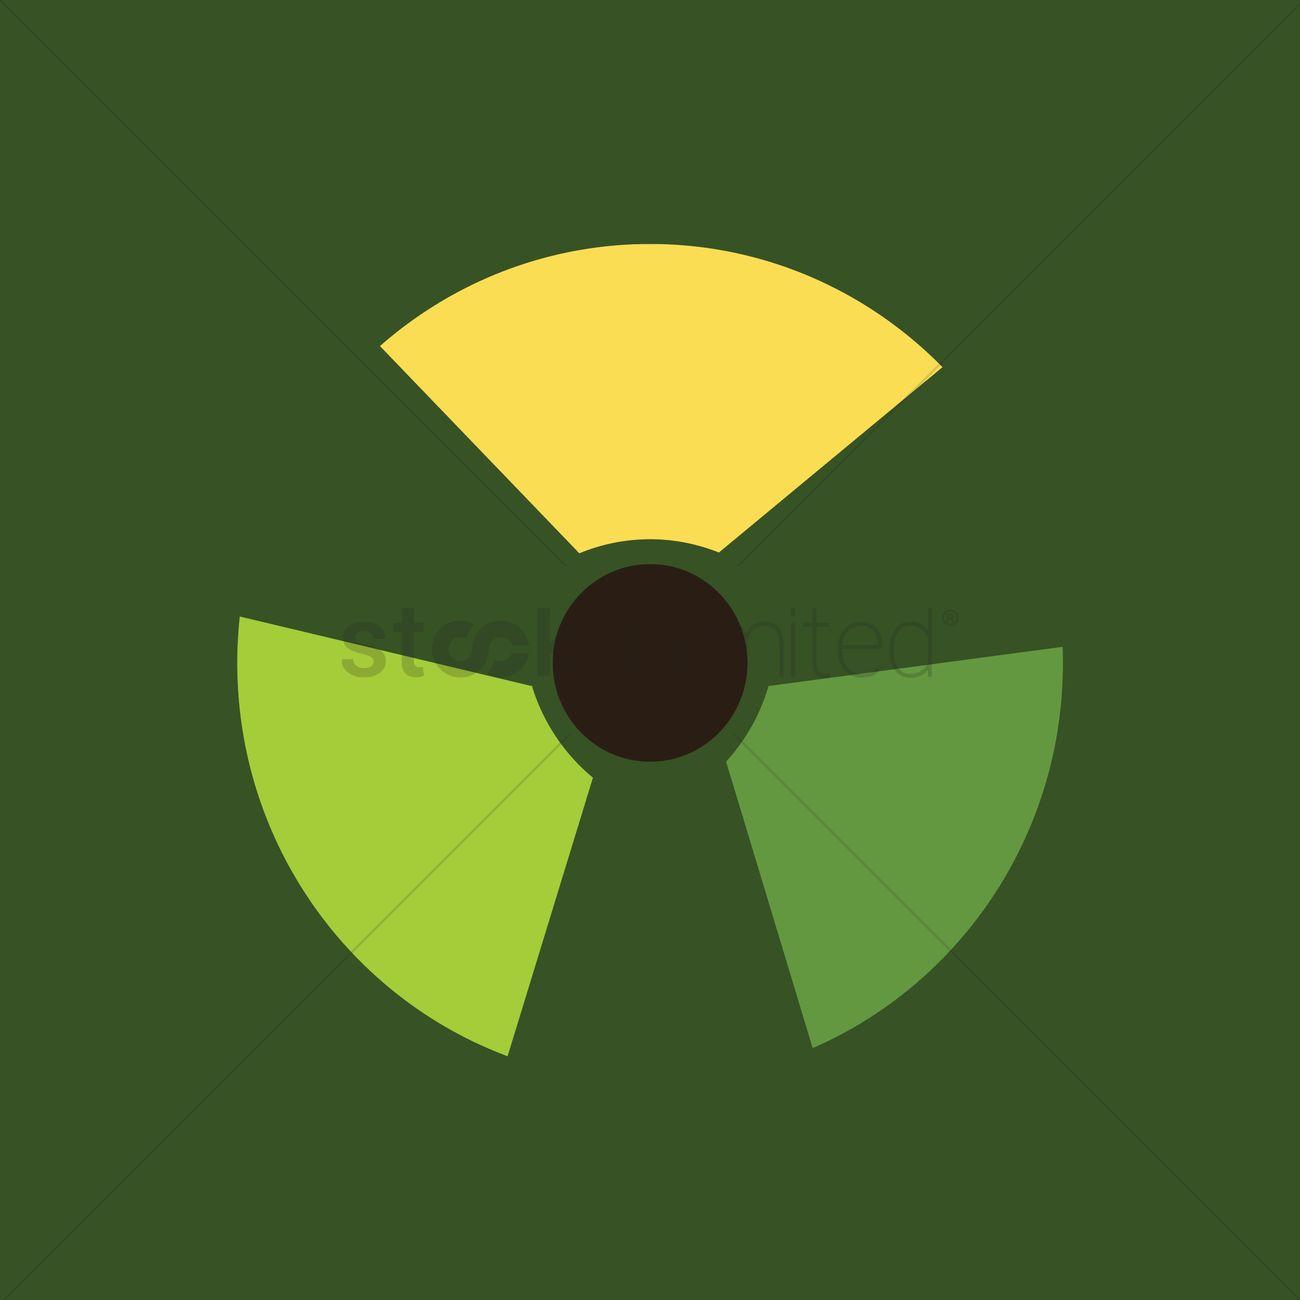 Radioactive symbol vector image 1544187 stockunlimited radioactive symbol vector graphic buycottarizona